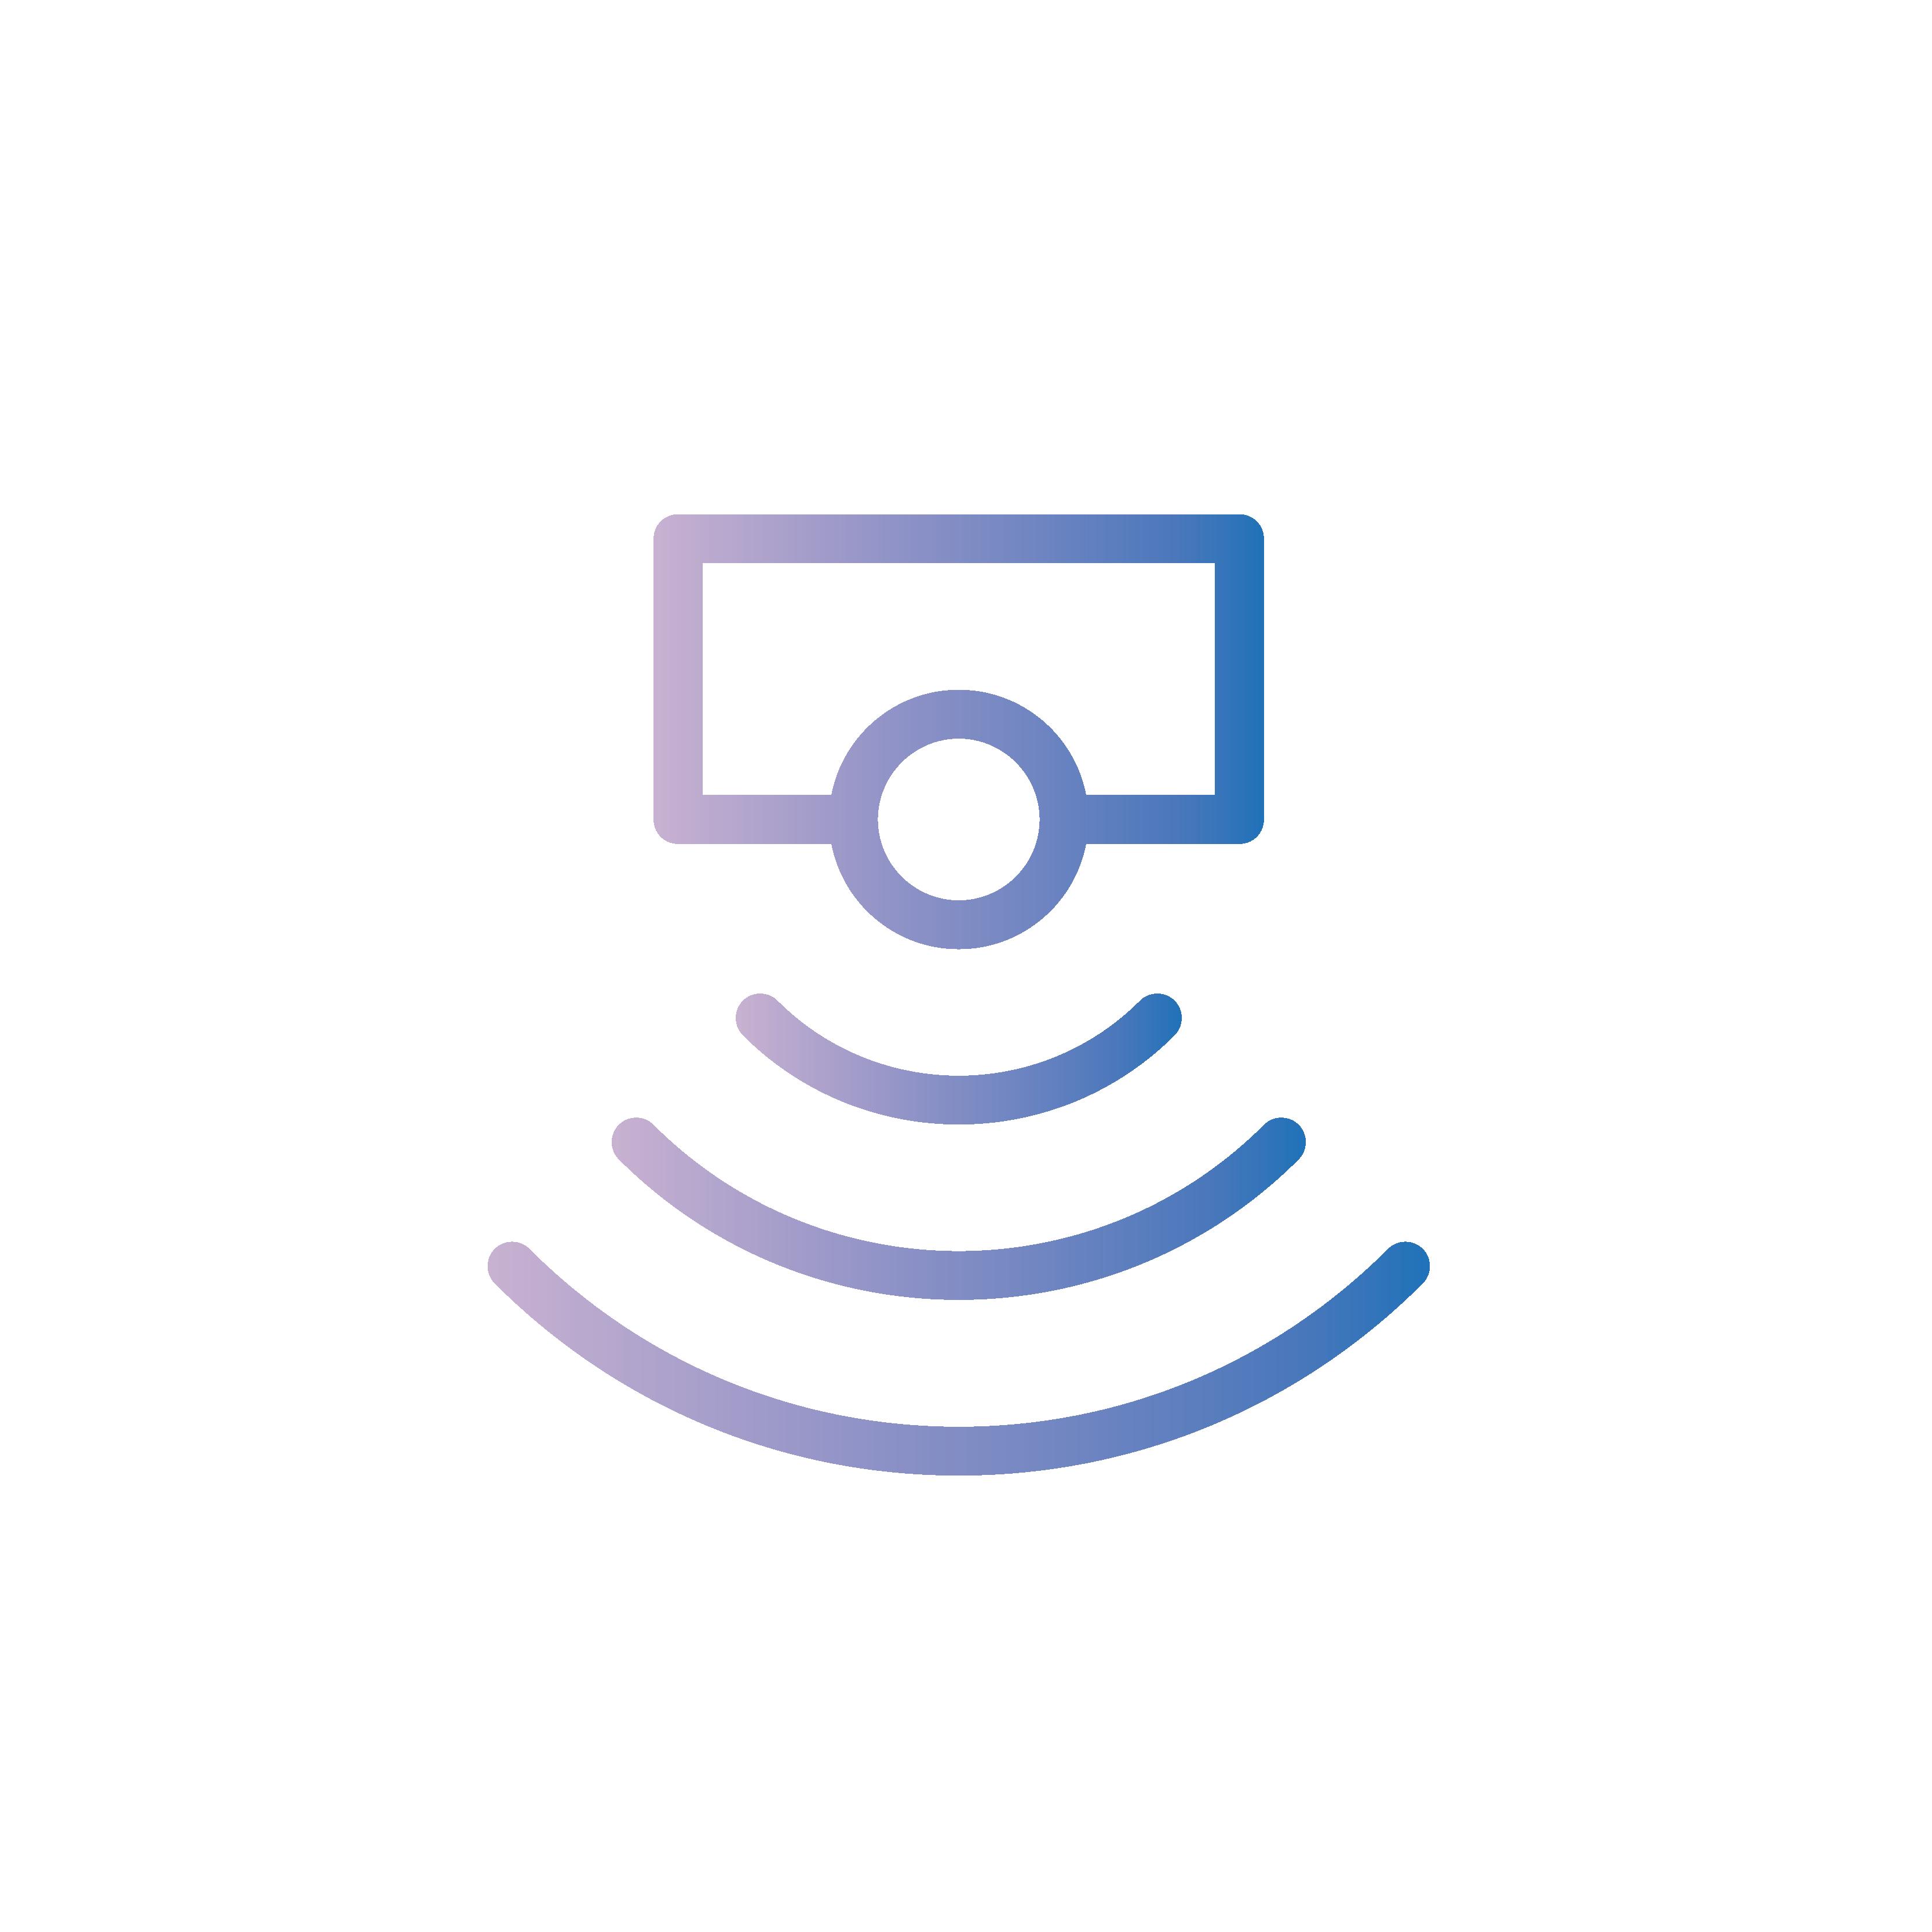 Sensor, Safety, Connectivity